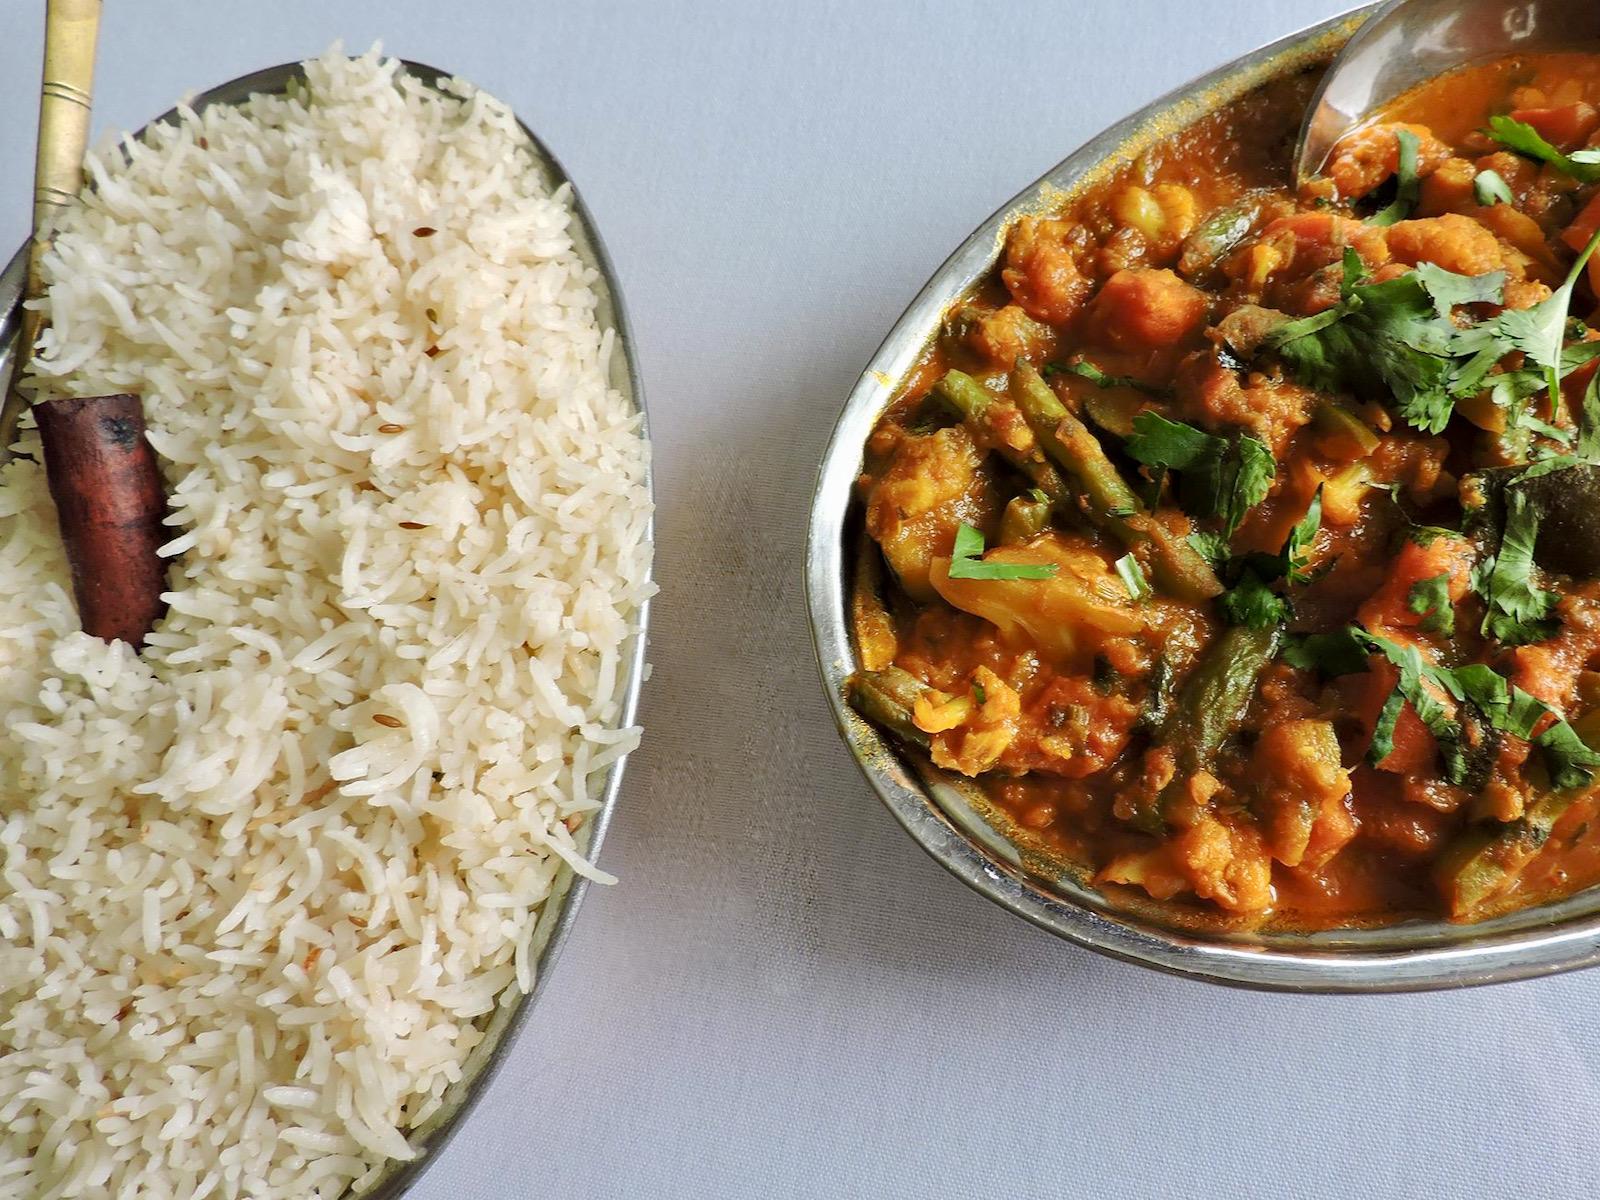 Indian dish and rice at India Garden